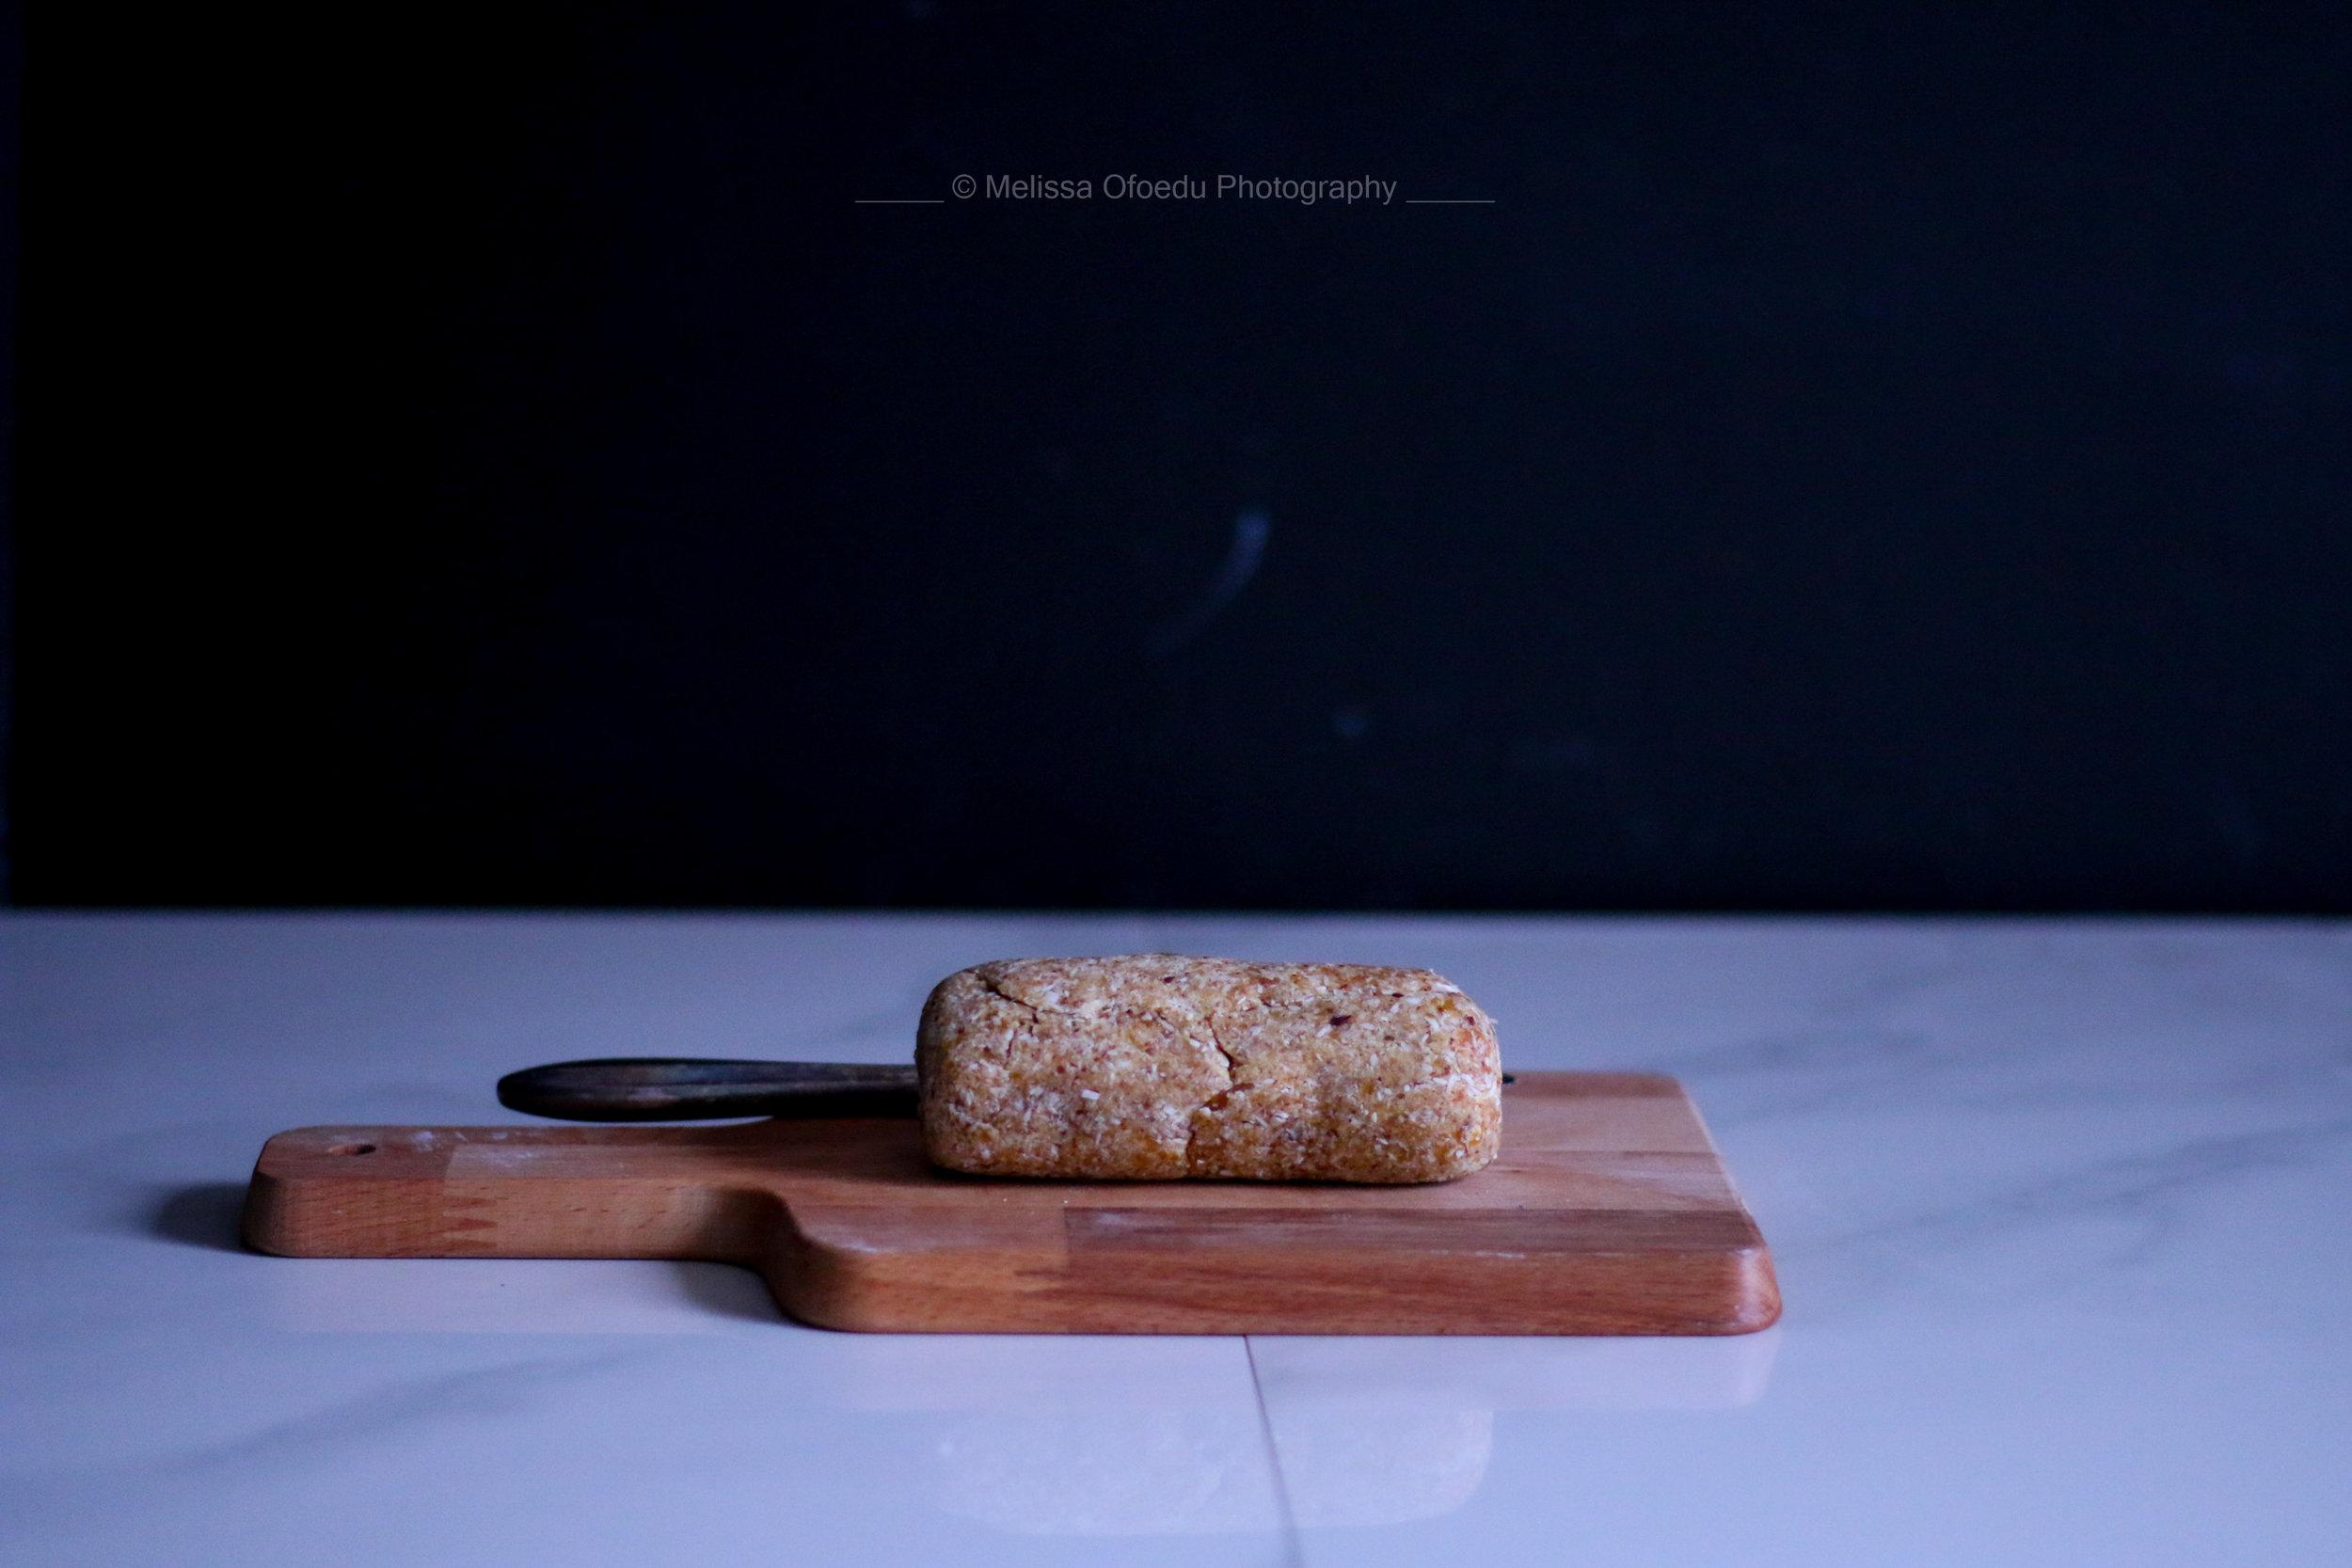 raw-vegan-krembos-melissa-ofoedu-photography-for-a-sweet-point-of-view-2-von-1